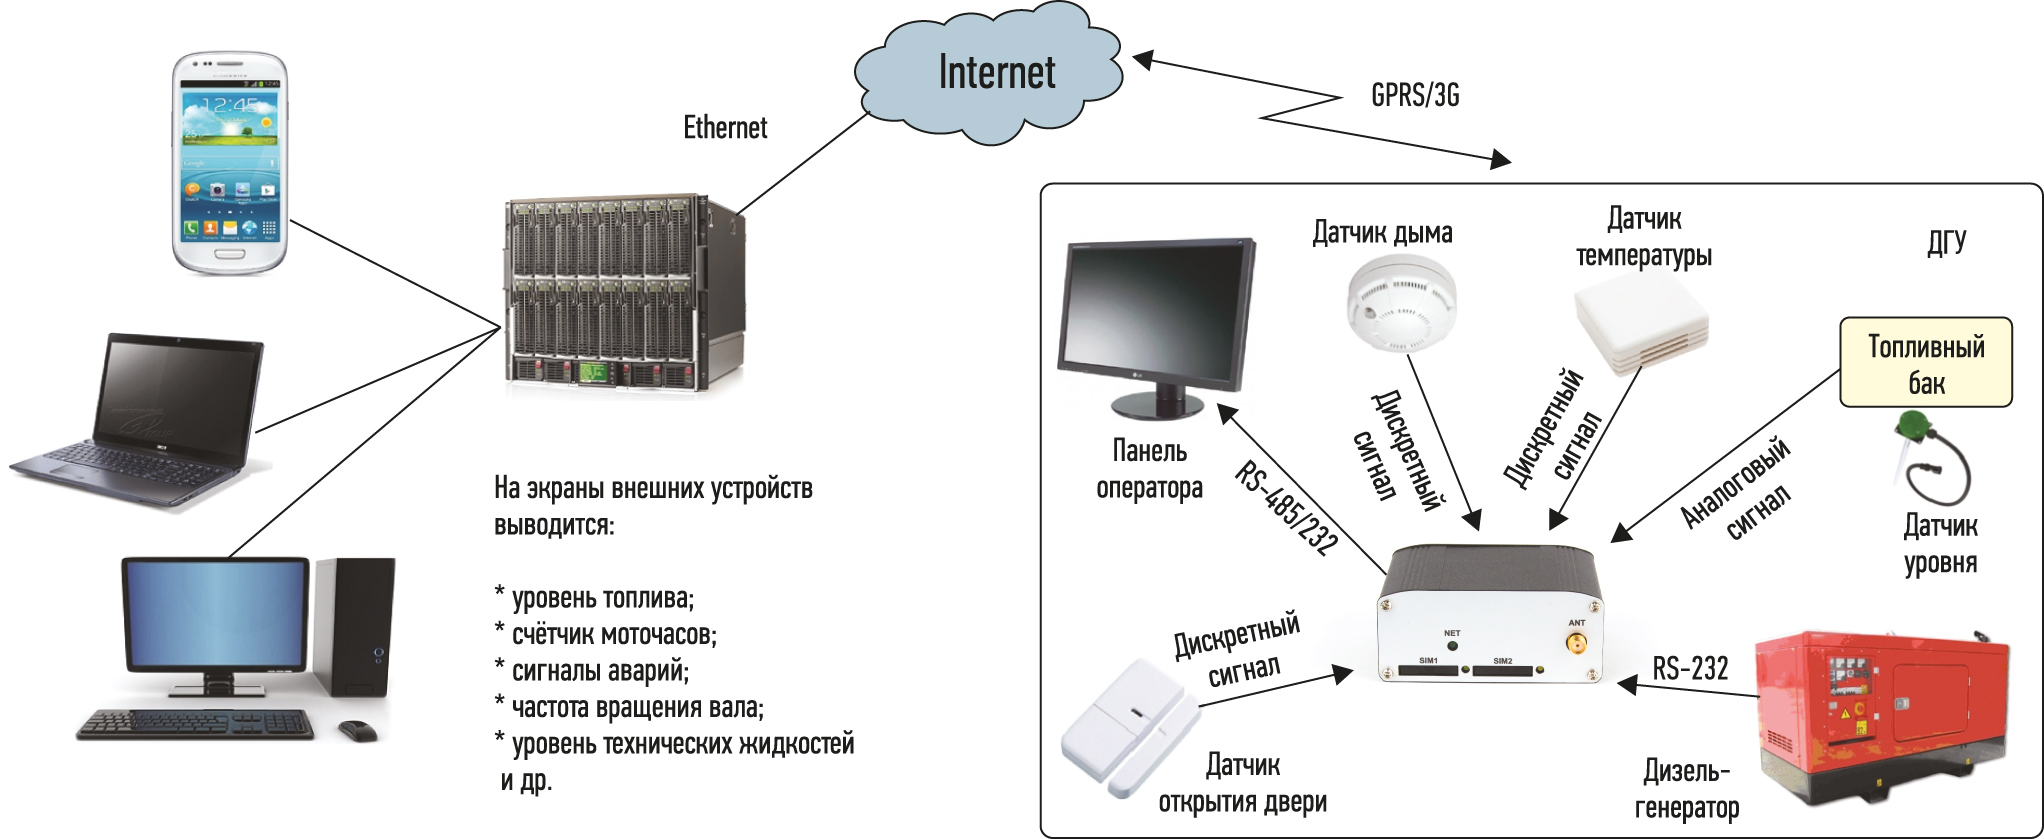 Схема подключения 3G-терминала Позитрон М 3G USB исп. E4